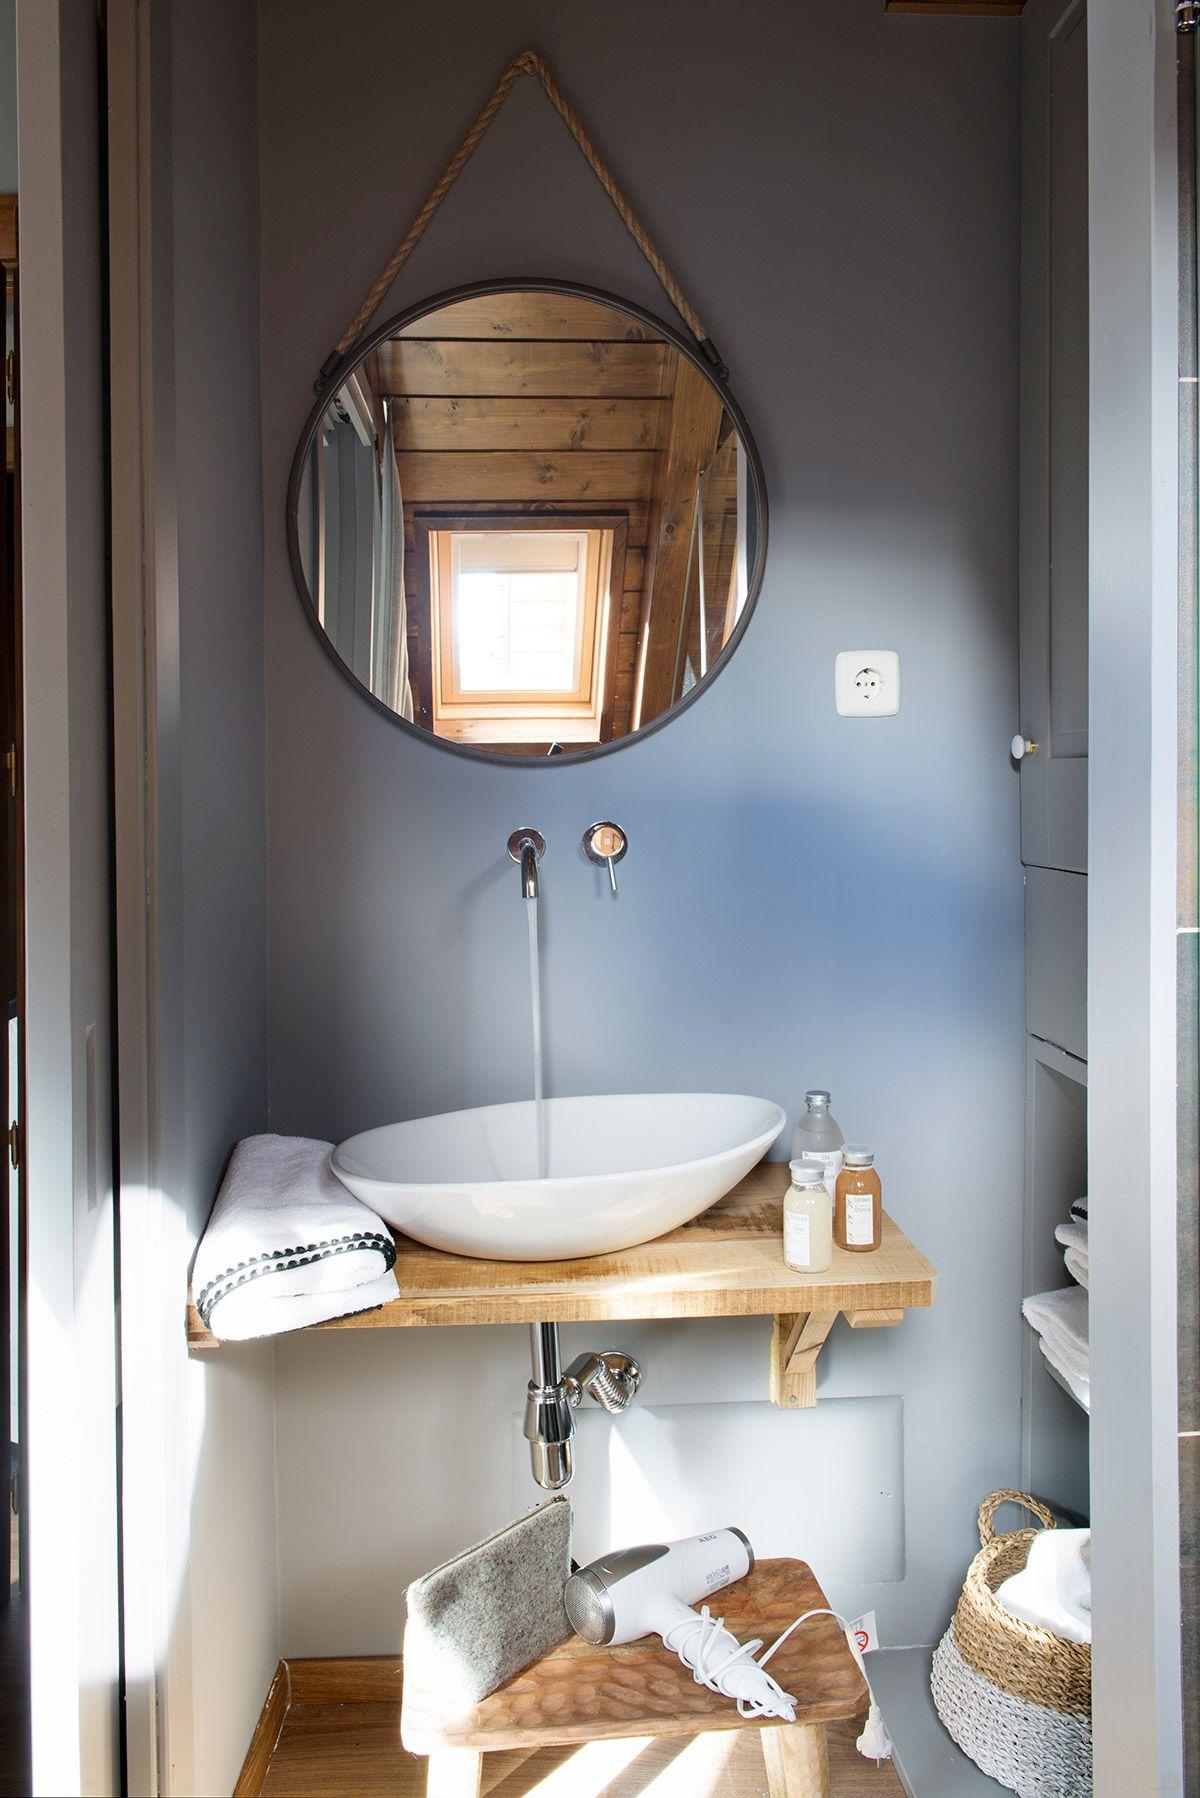 27. Viva el blanco | Espejos para baños, Espejo redondo ...